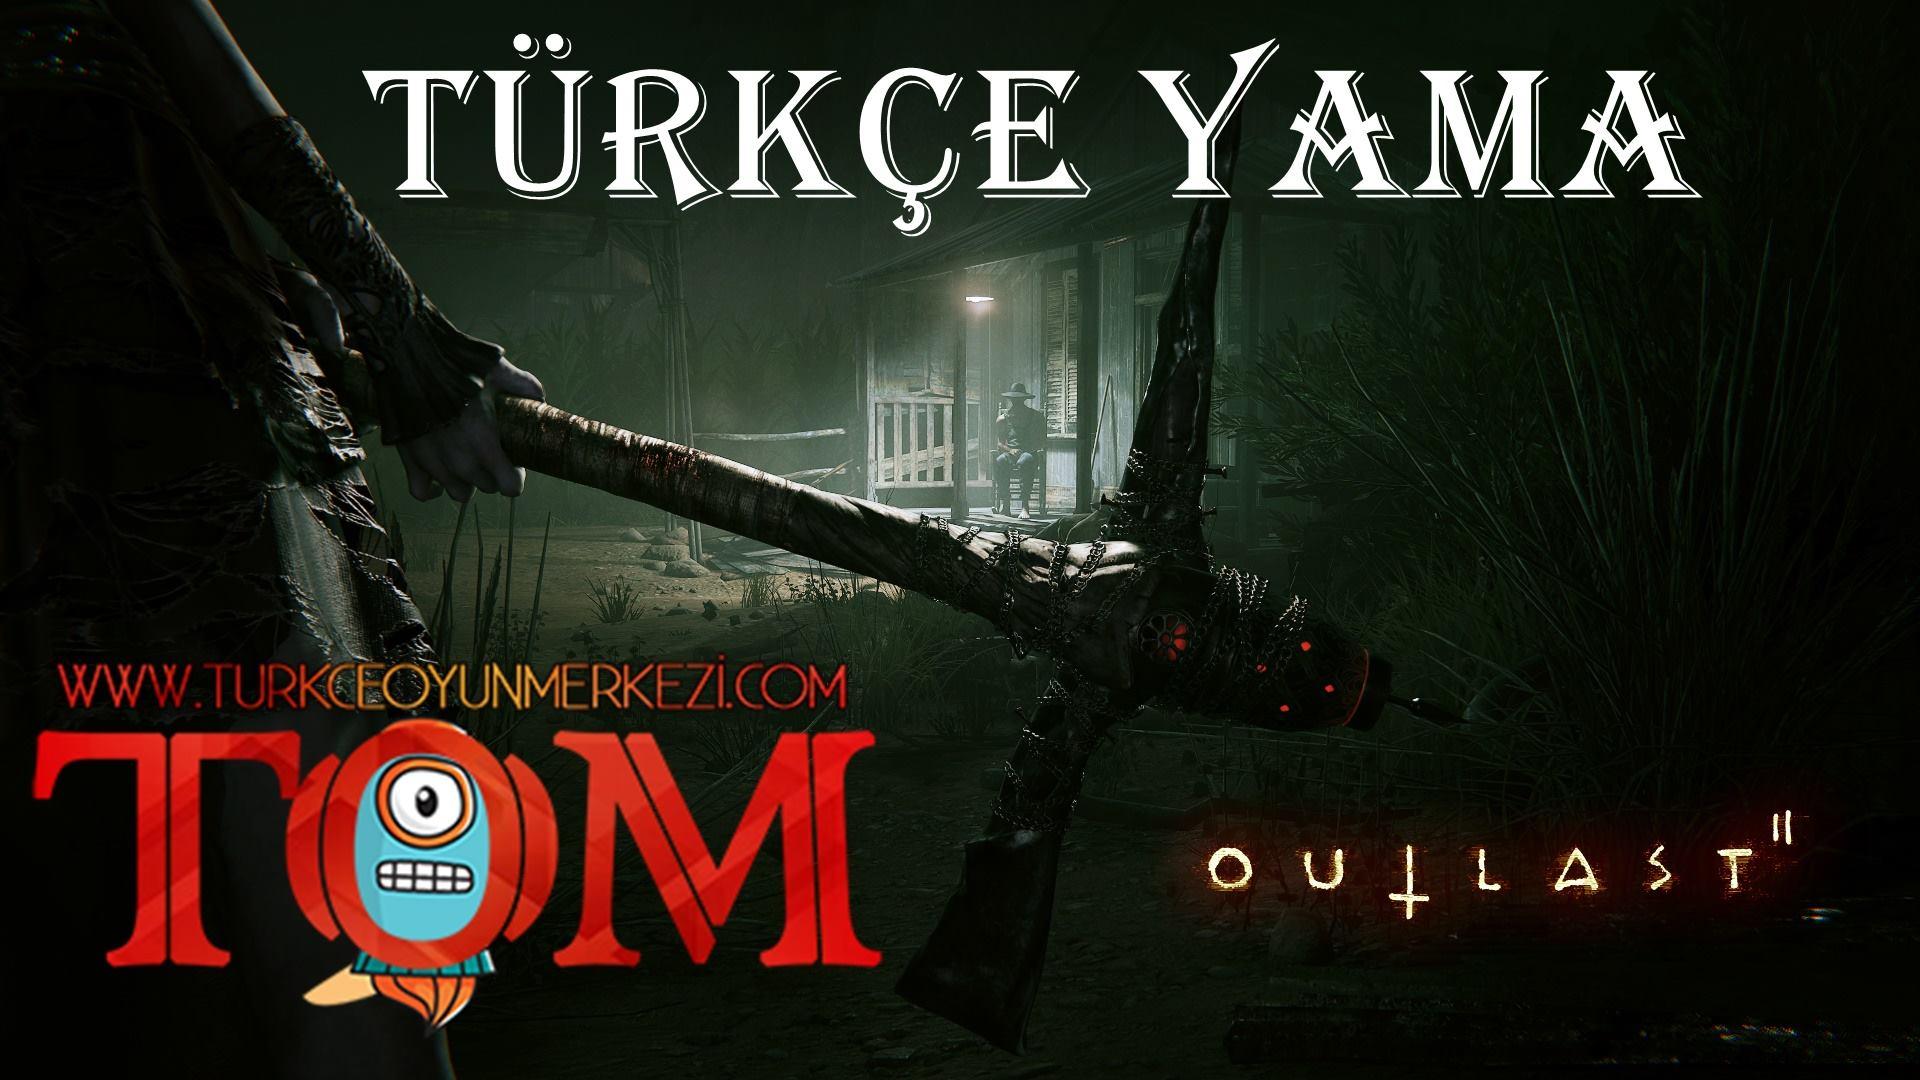 Outlast v2 %100 Türkçe Yama